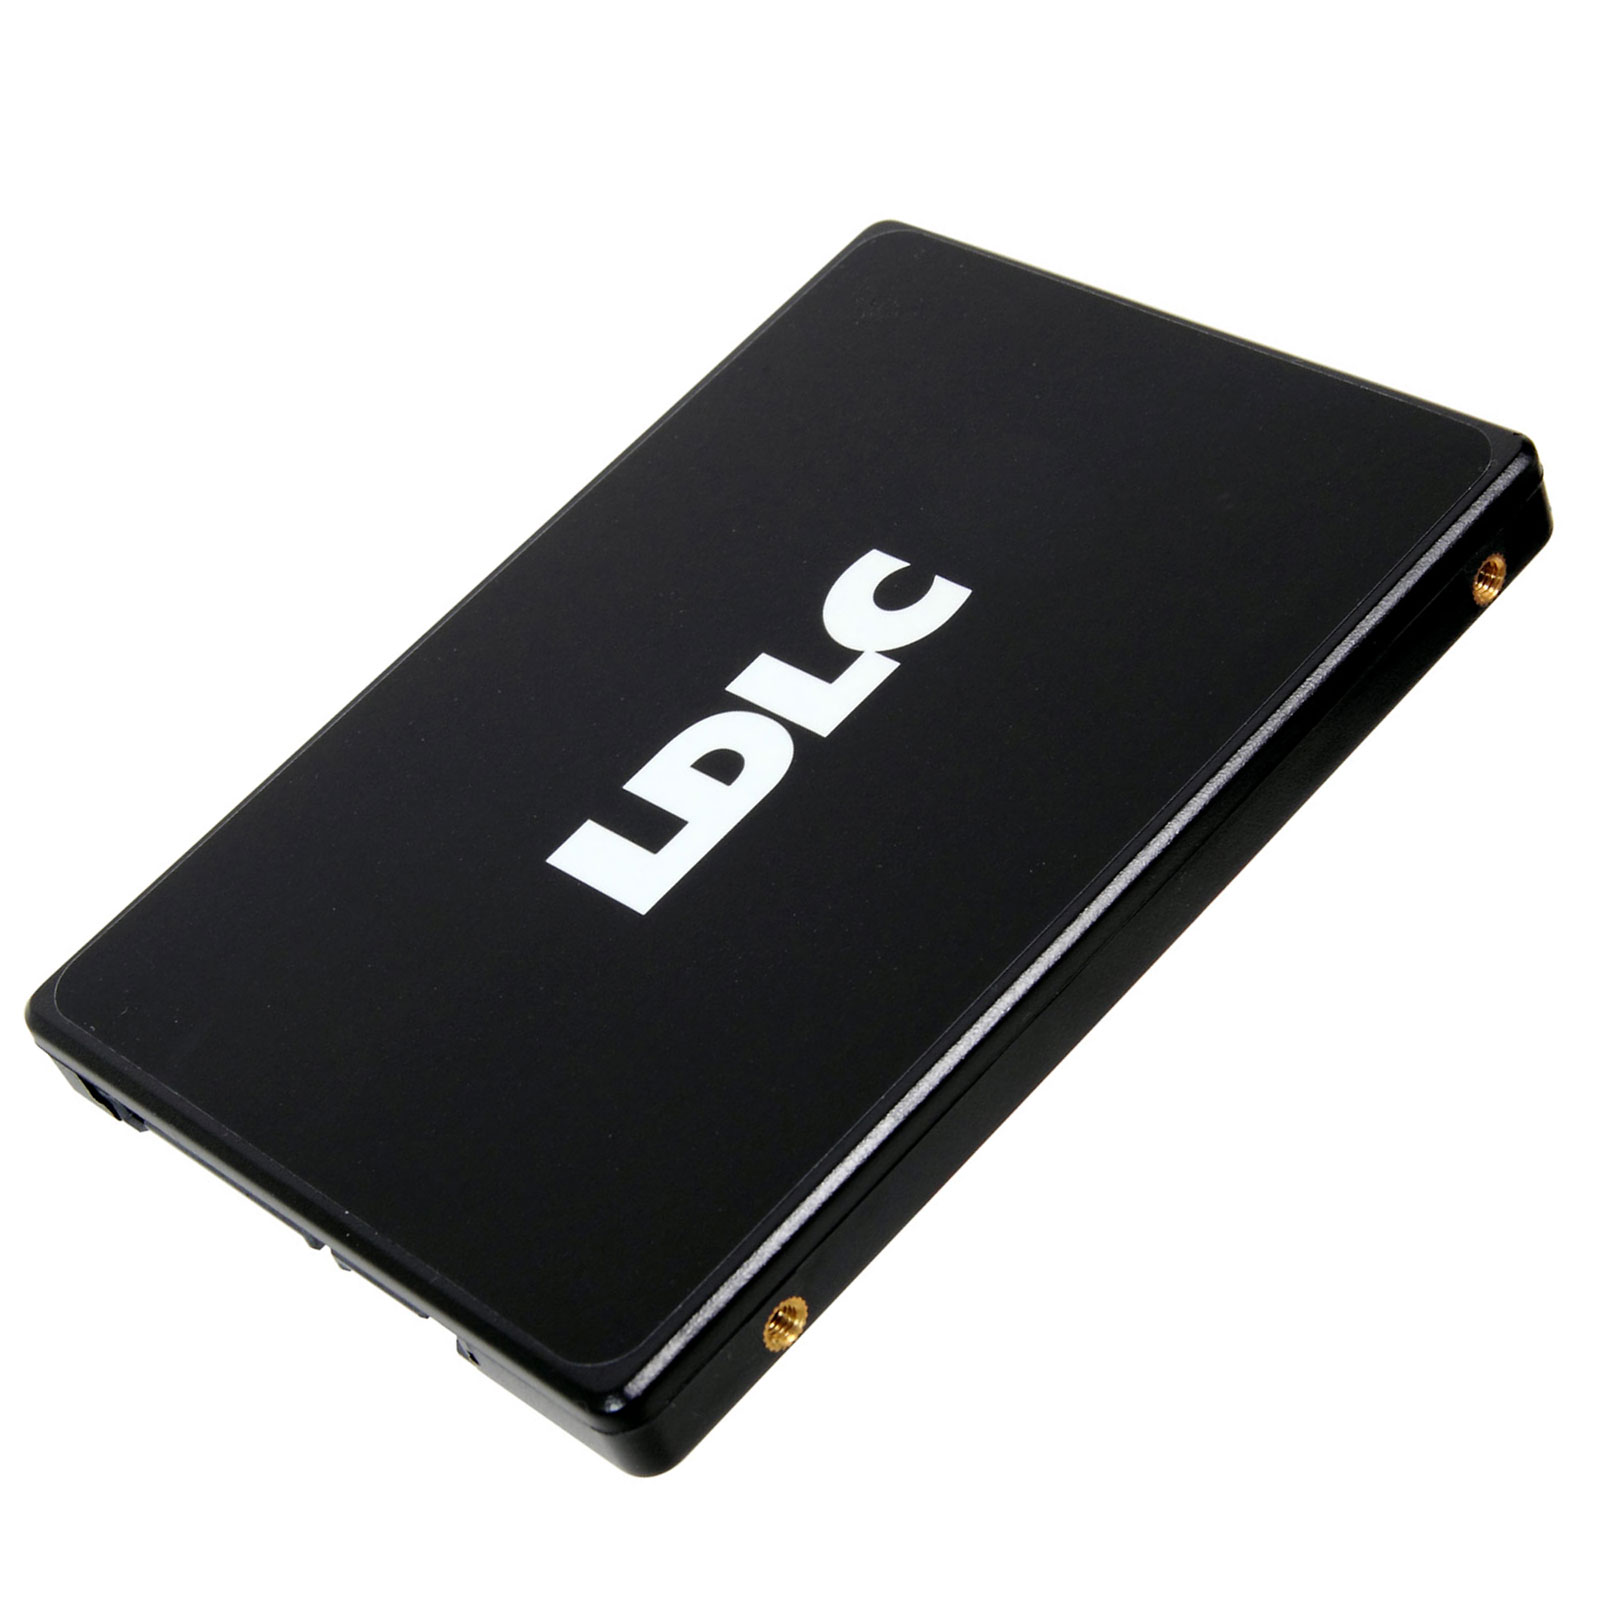 "Disque SSD LDLC SSD F7 PLUS 3D NAND 240 GB SSD 240 Go NAND 3D TLC 2.5"" 7mm Serial ATA 6Gb/s"